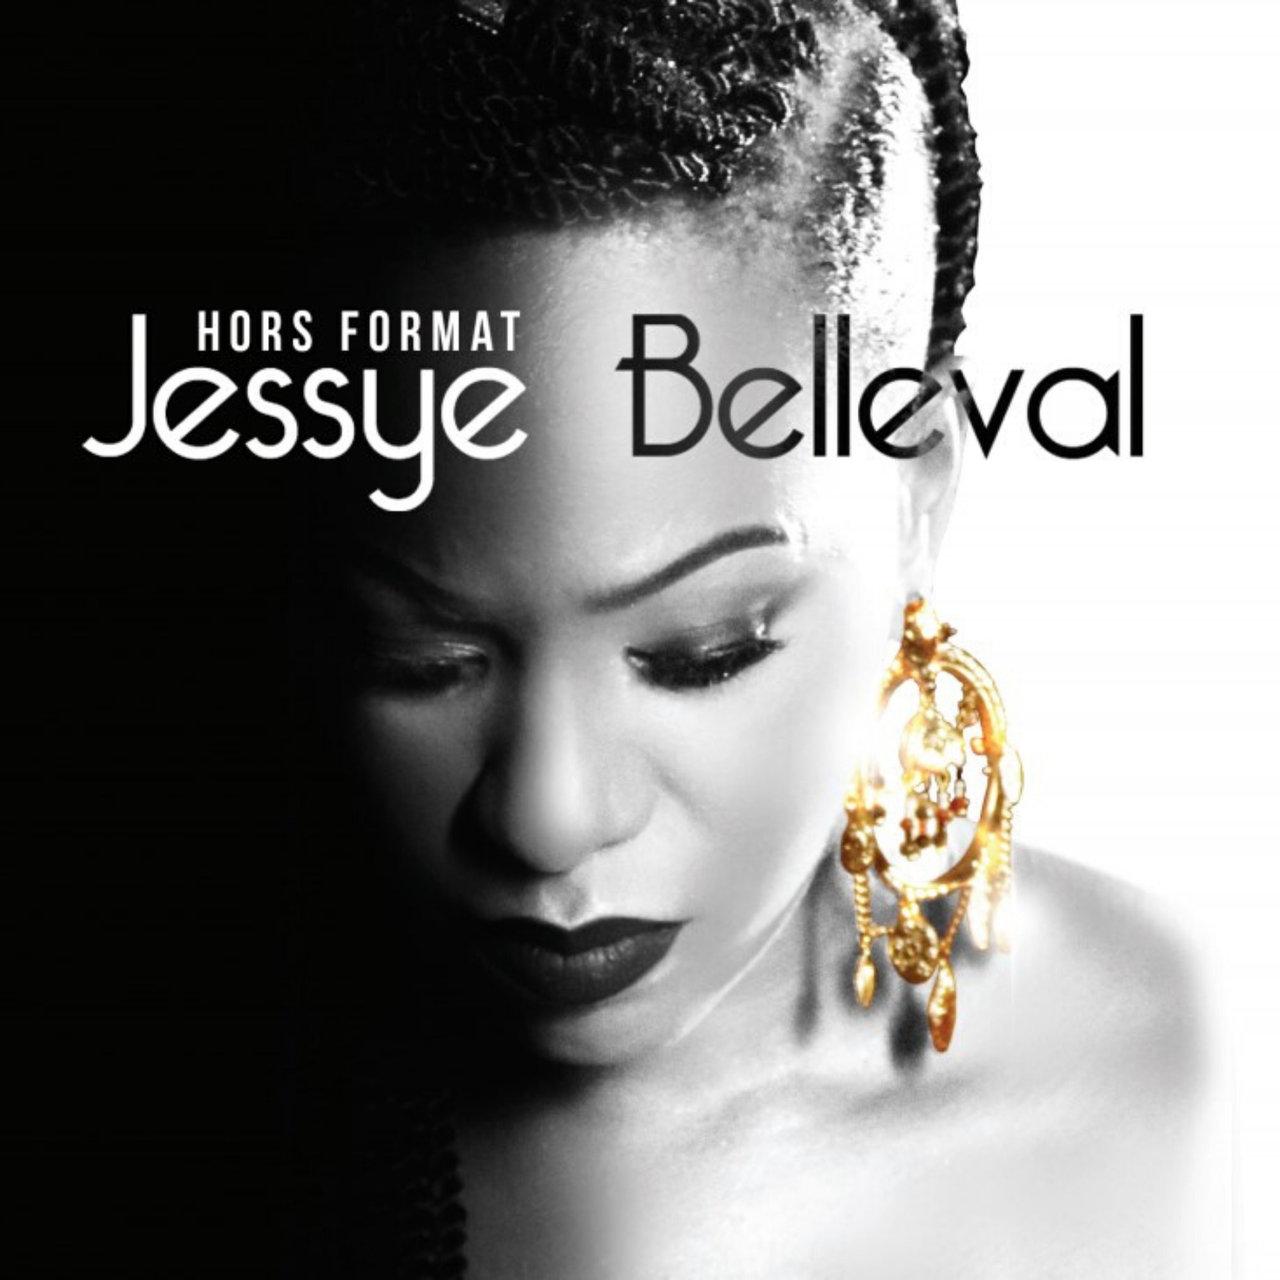 Jessye Belleval - Hors Format (Cover)